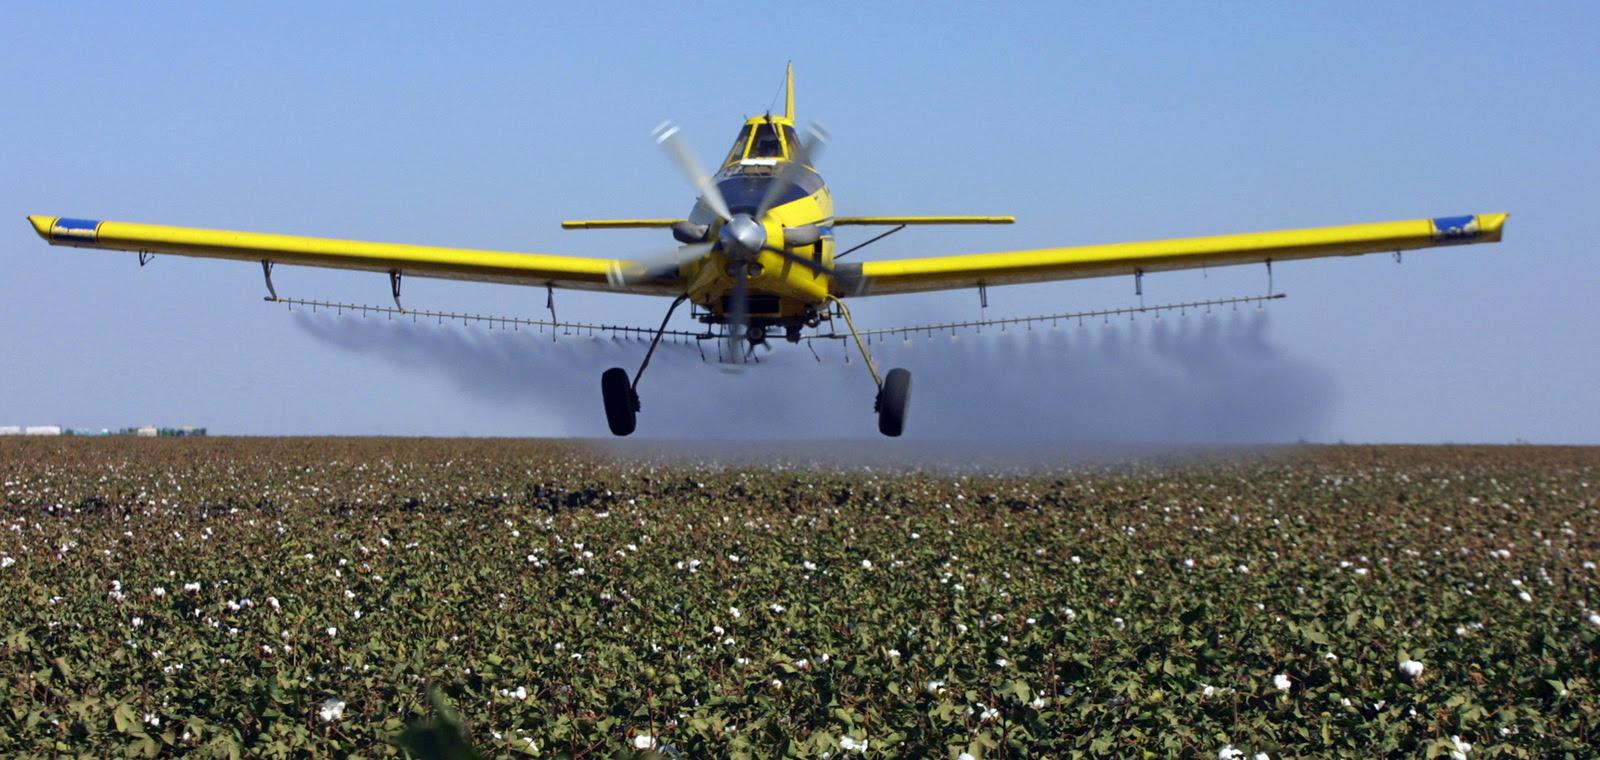 A crop dusting plane from Blair Air Service dusts cotton crops in Lemoore, Calif. (AP/Gary Kazanjian)